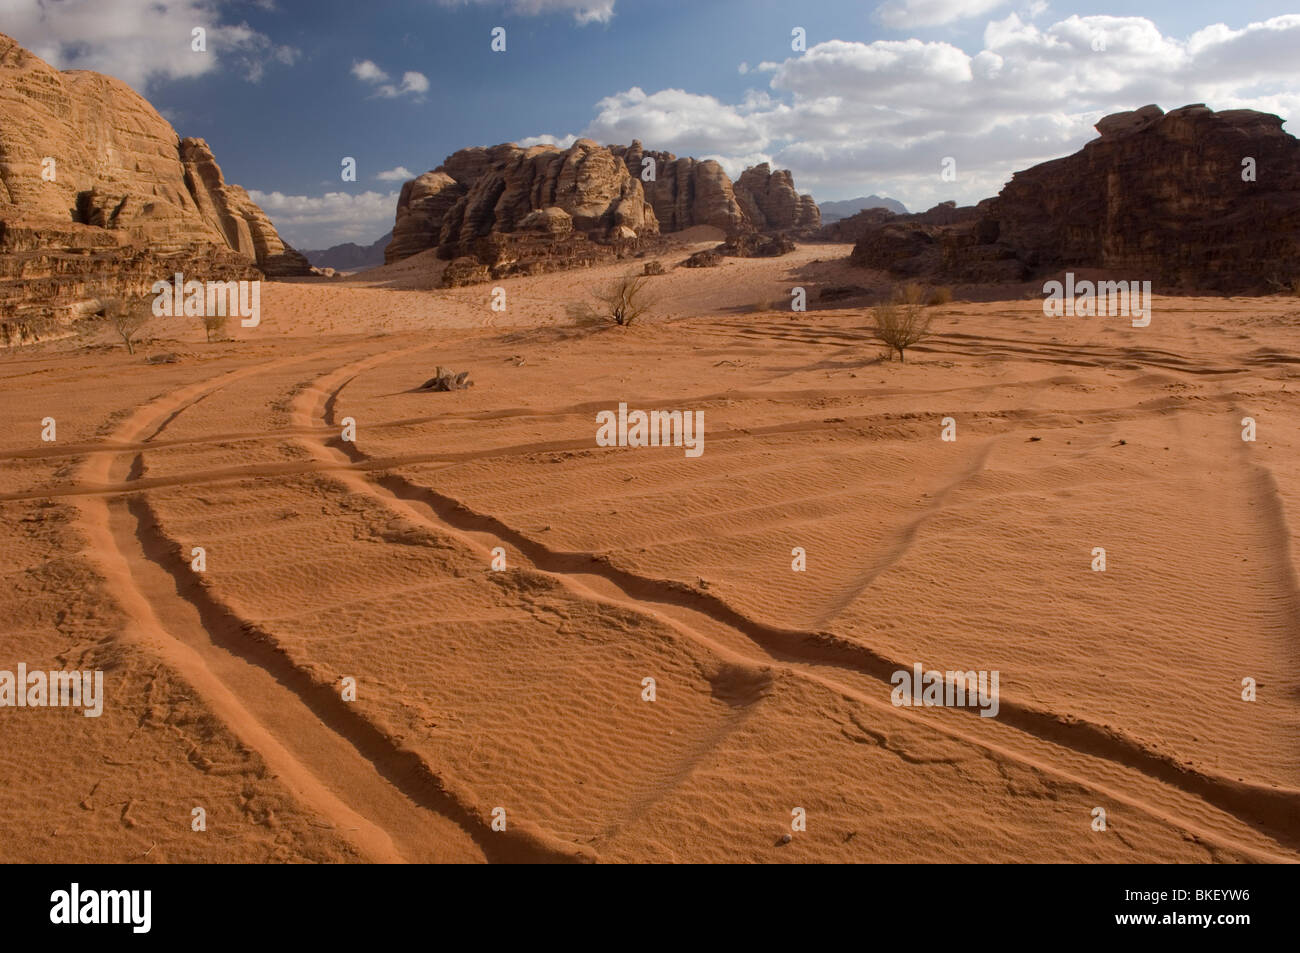 Tyre tracks in the desert of Wadi Rum, Jordan - Stock Image